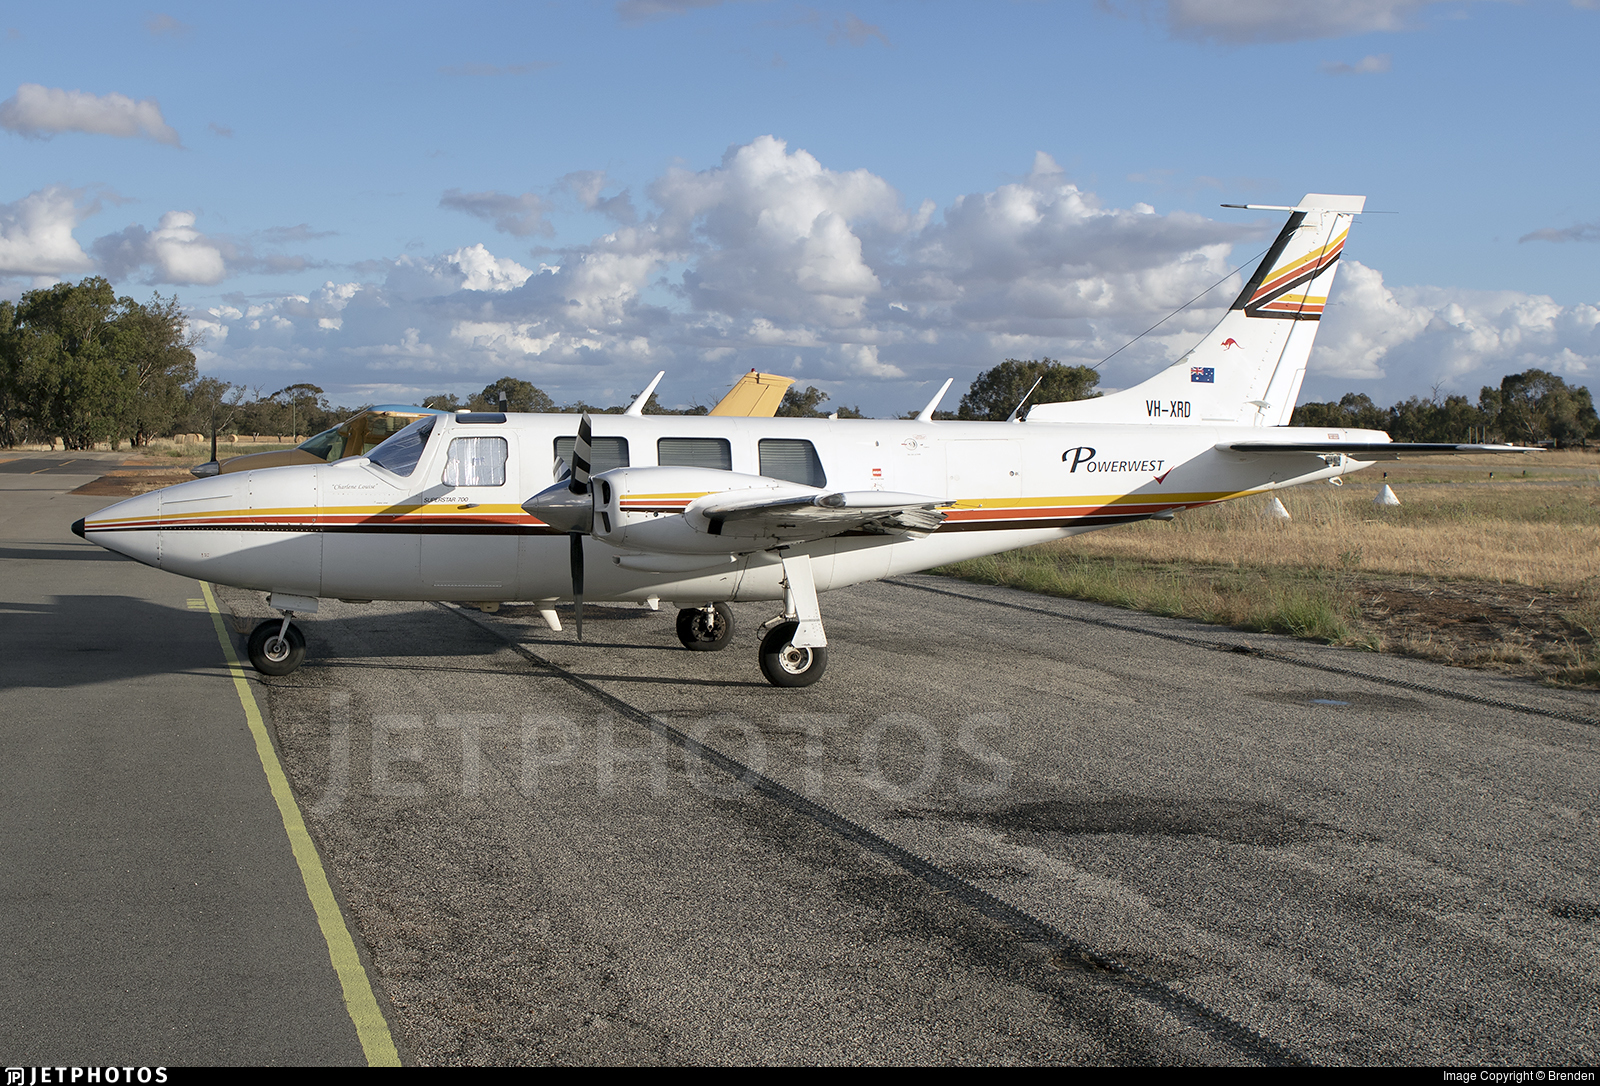 VH-XRD - Piper PA-60 602P Aerostar  - Private